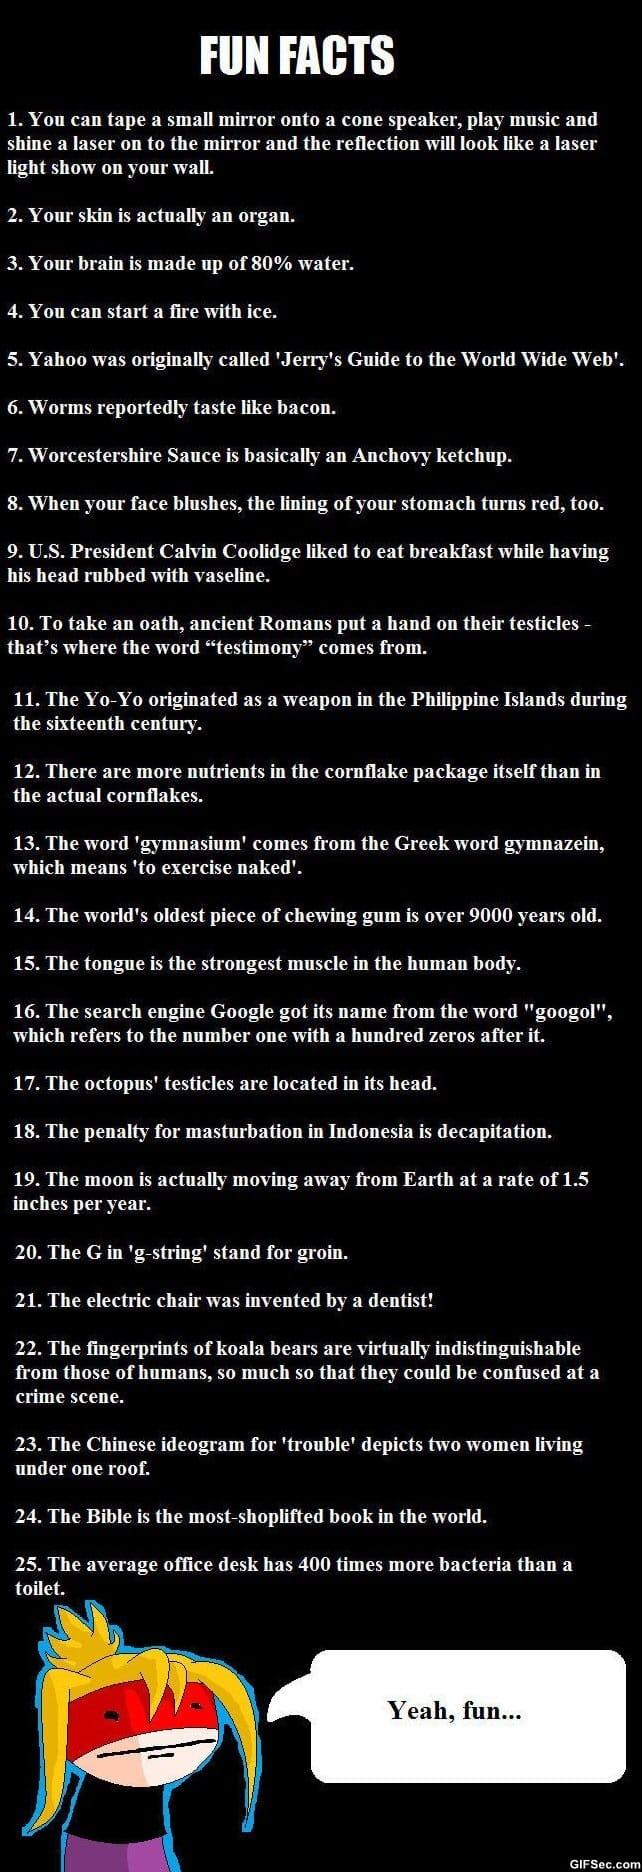 funny-fun-facts